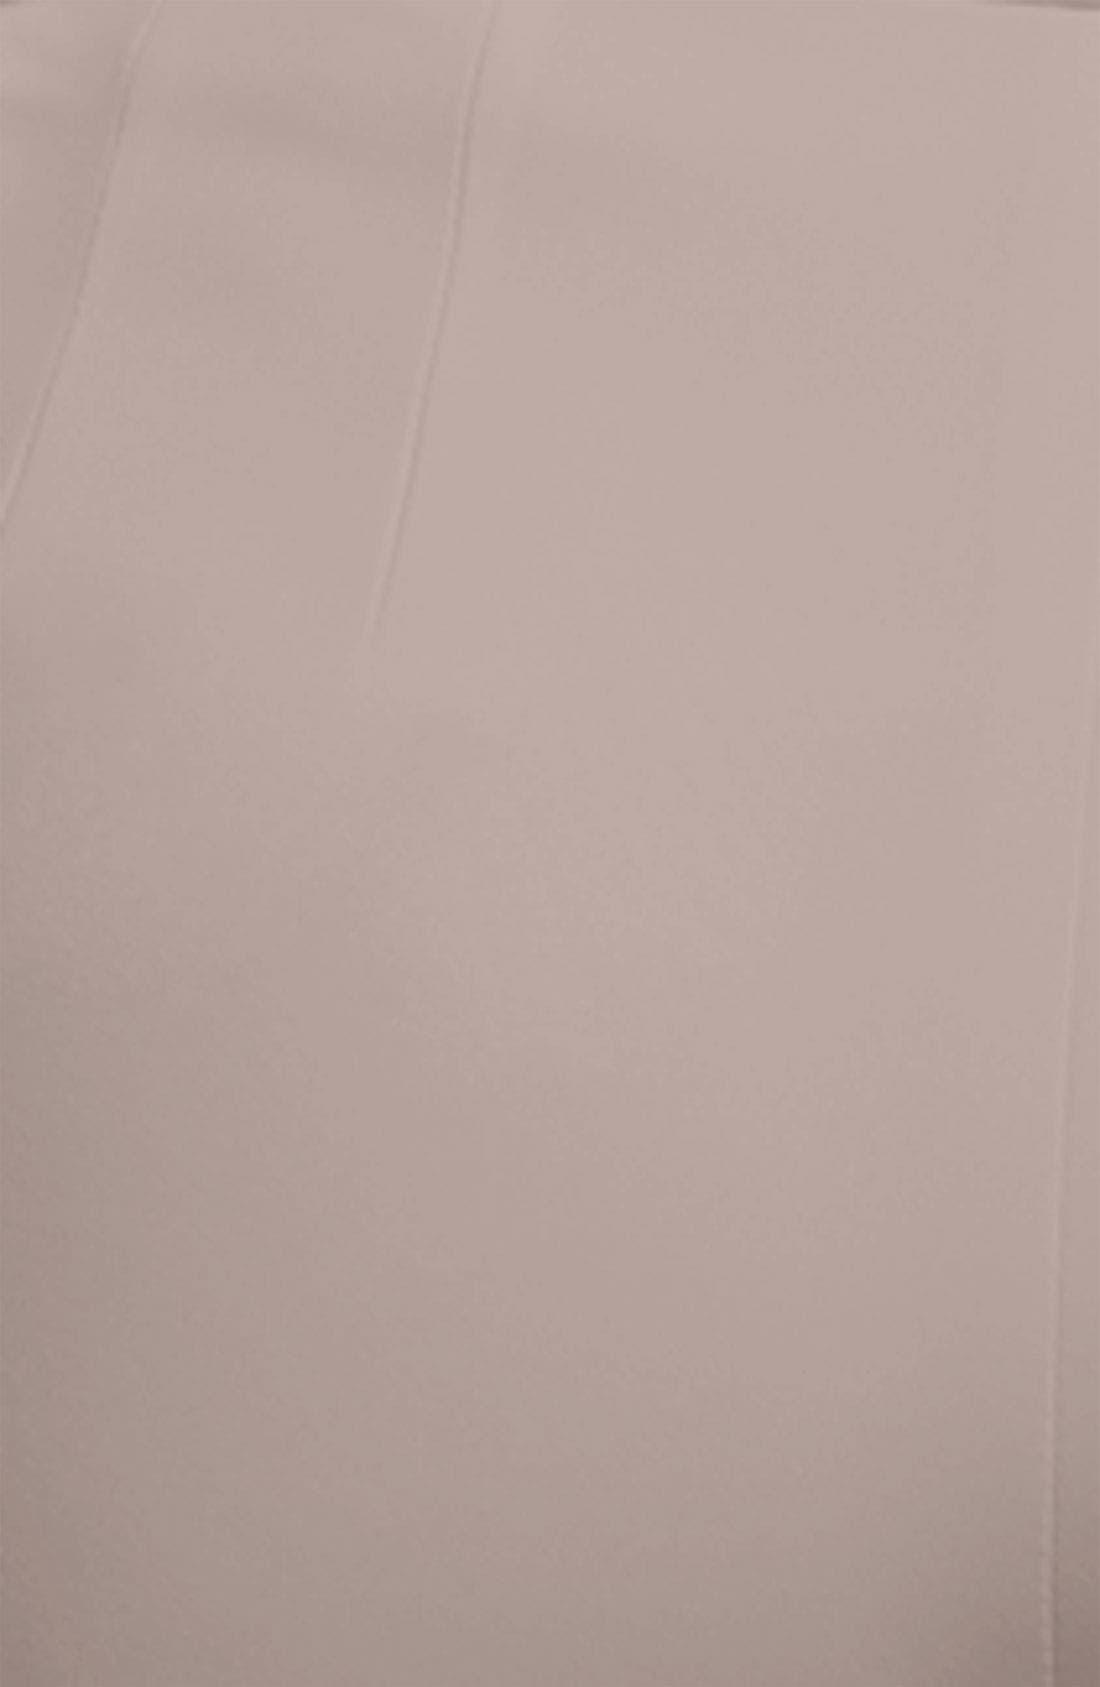 Alternate Image 3  - St. John Collection 'Emma' Crepe Marocain Crop Pants